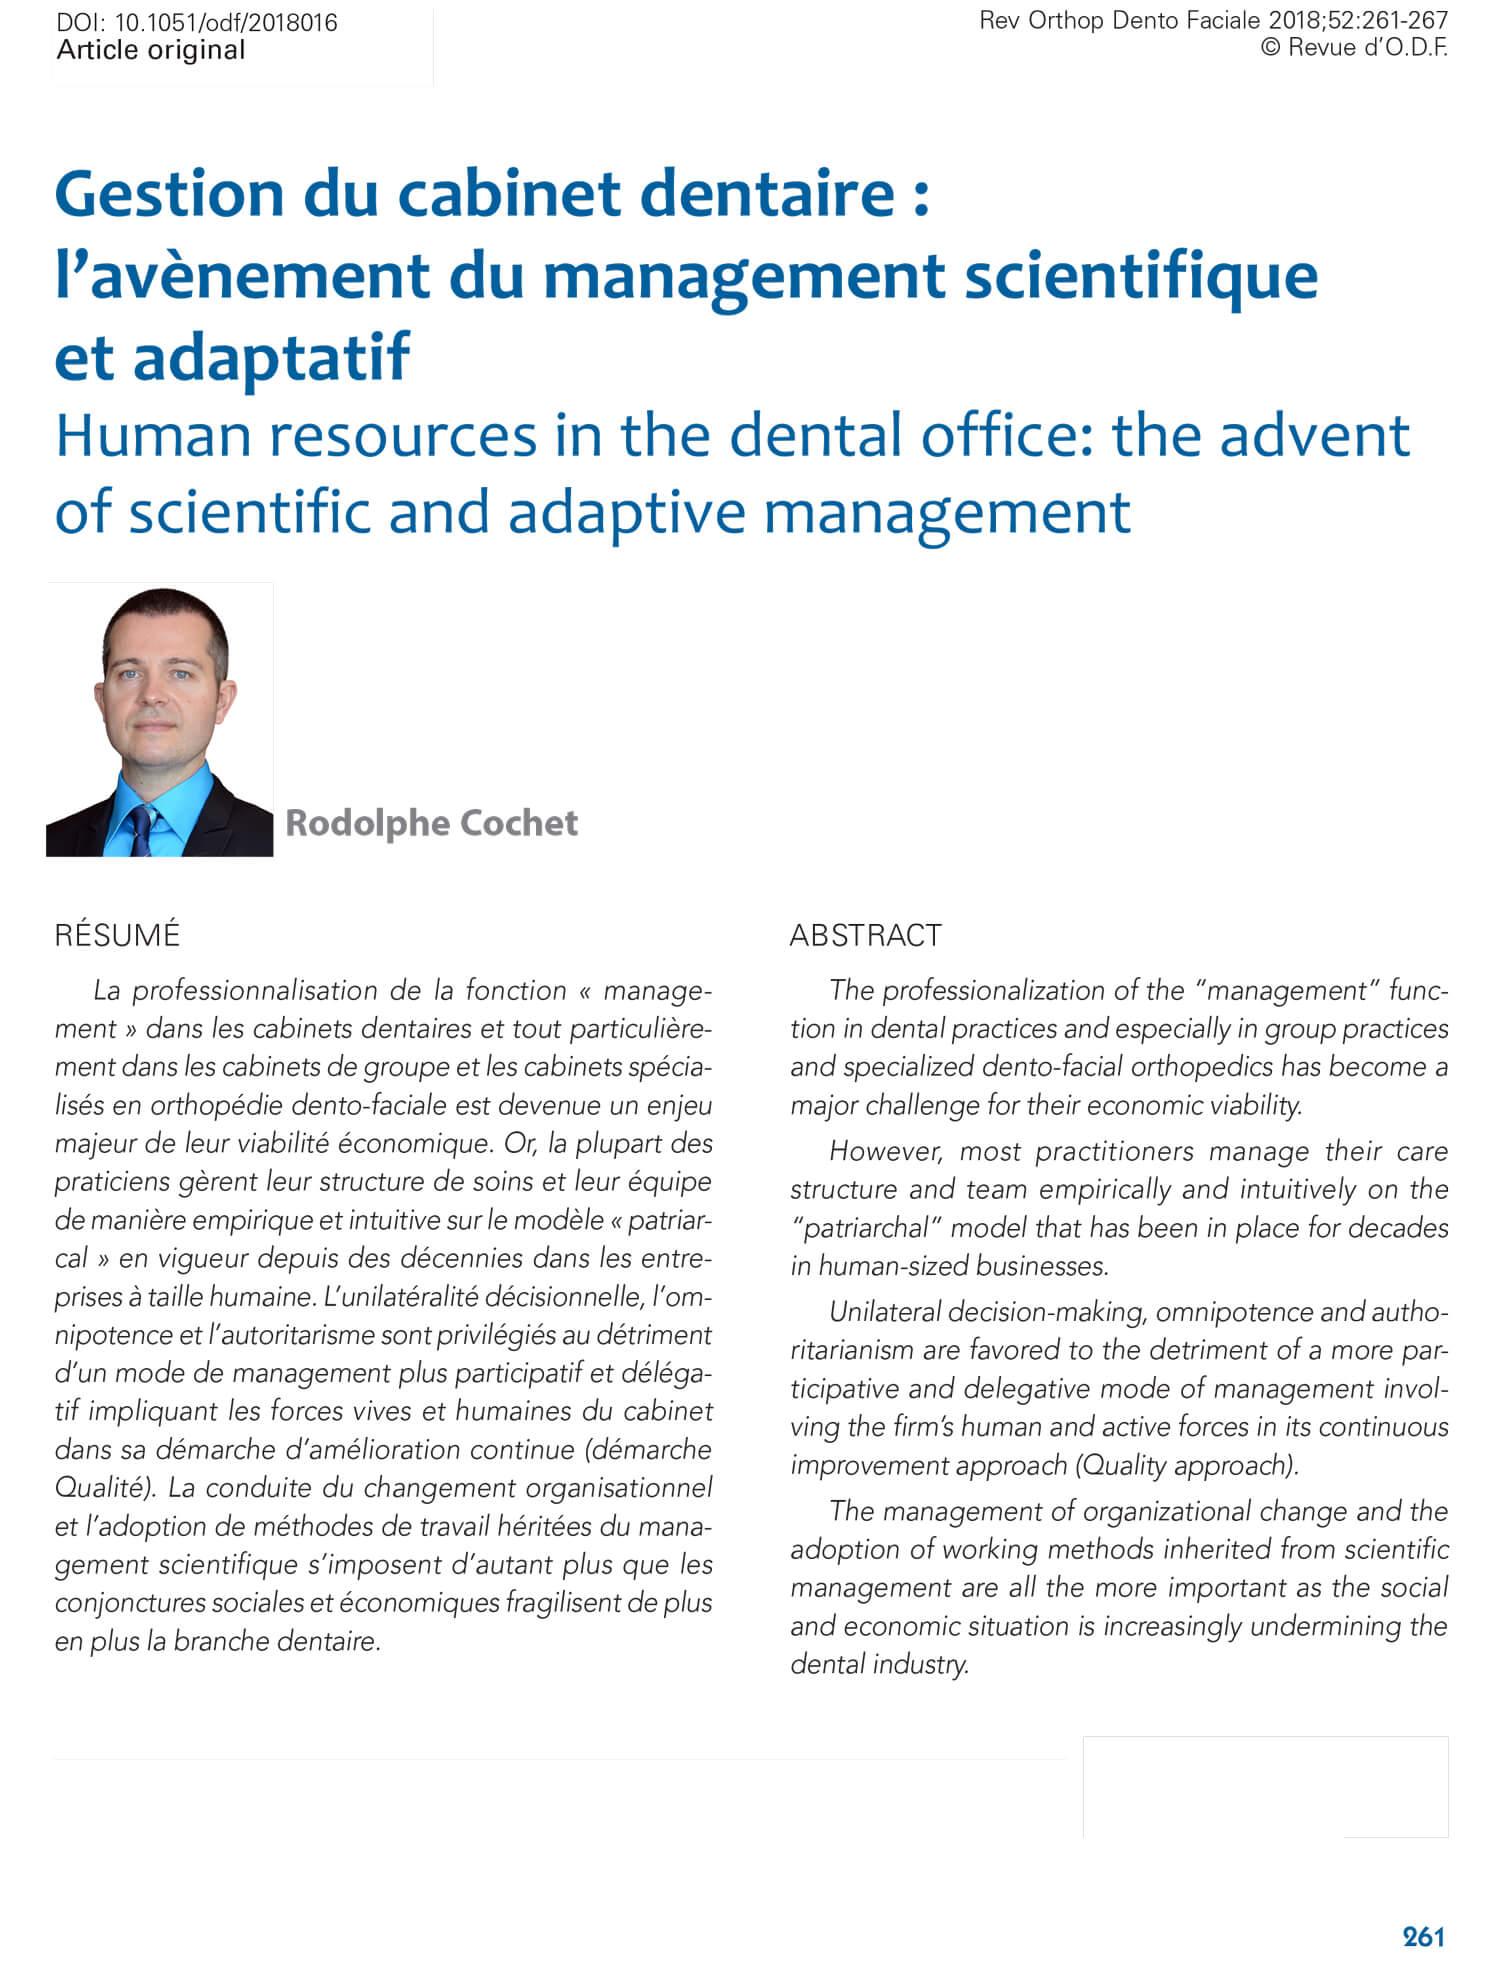 gestion-cabinet-dentaire-management-scientifique-rodolphe-cochet-coach-coaching-formation.jpg